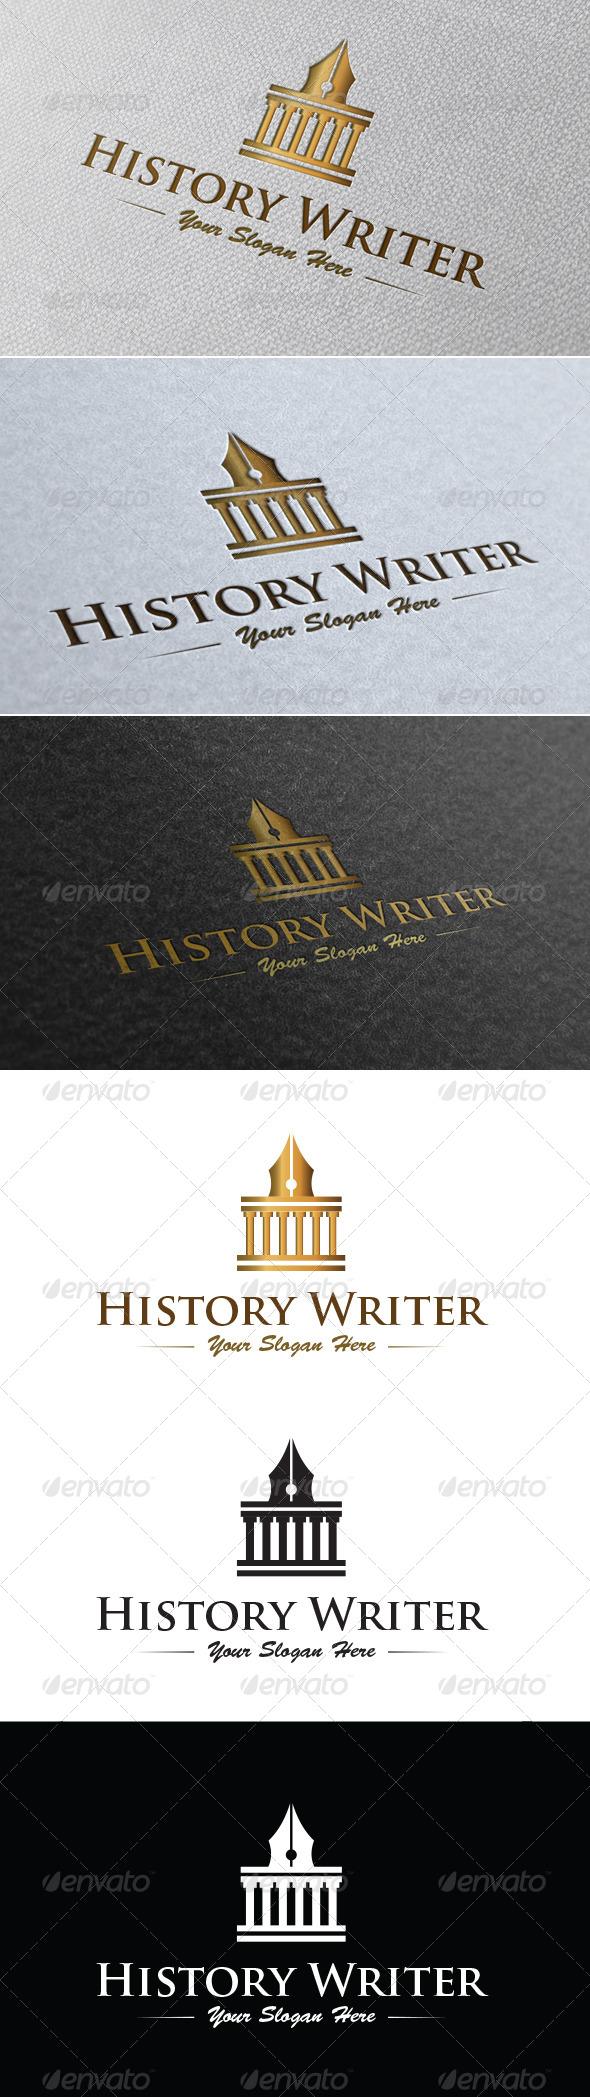 History Writer Logo Template